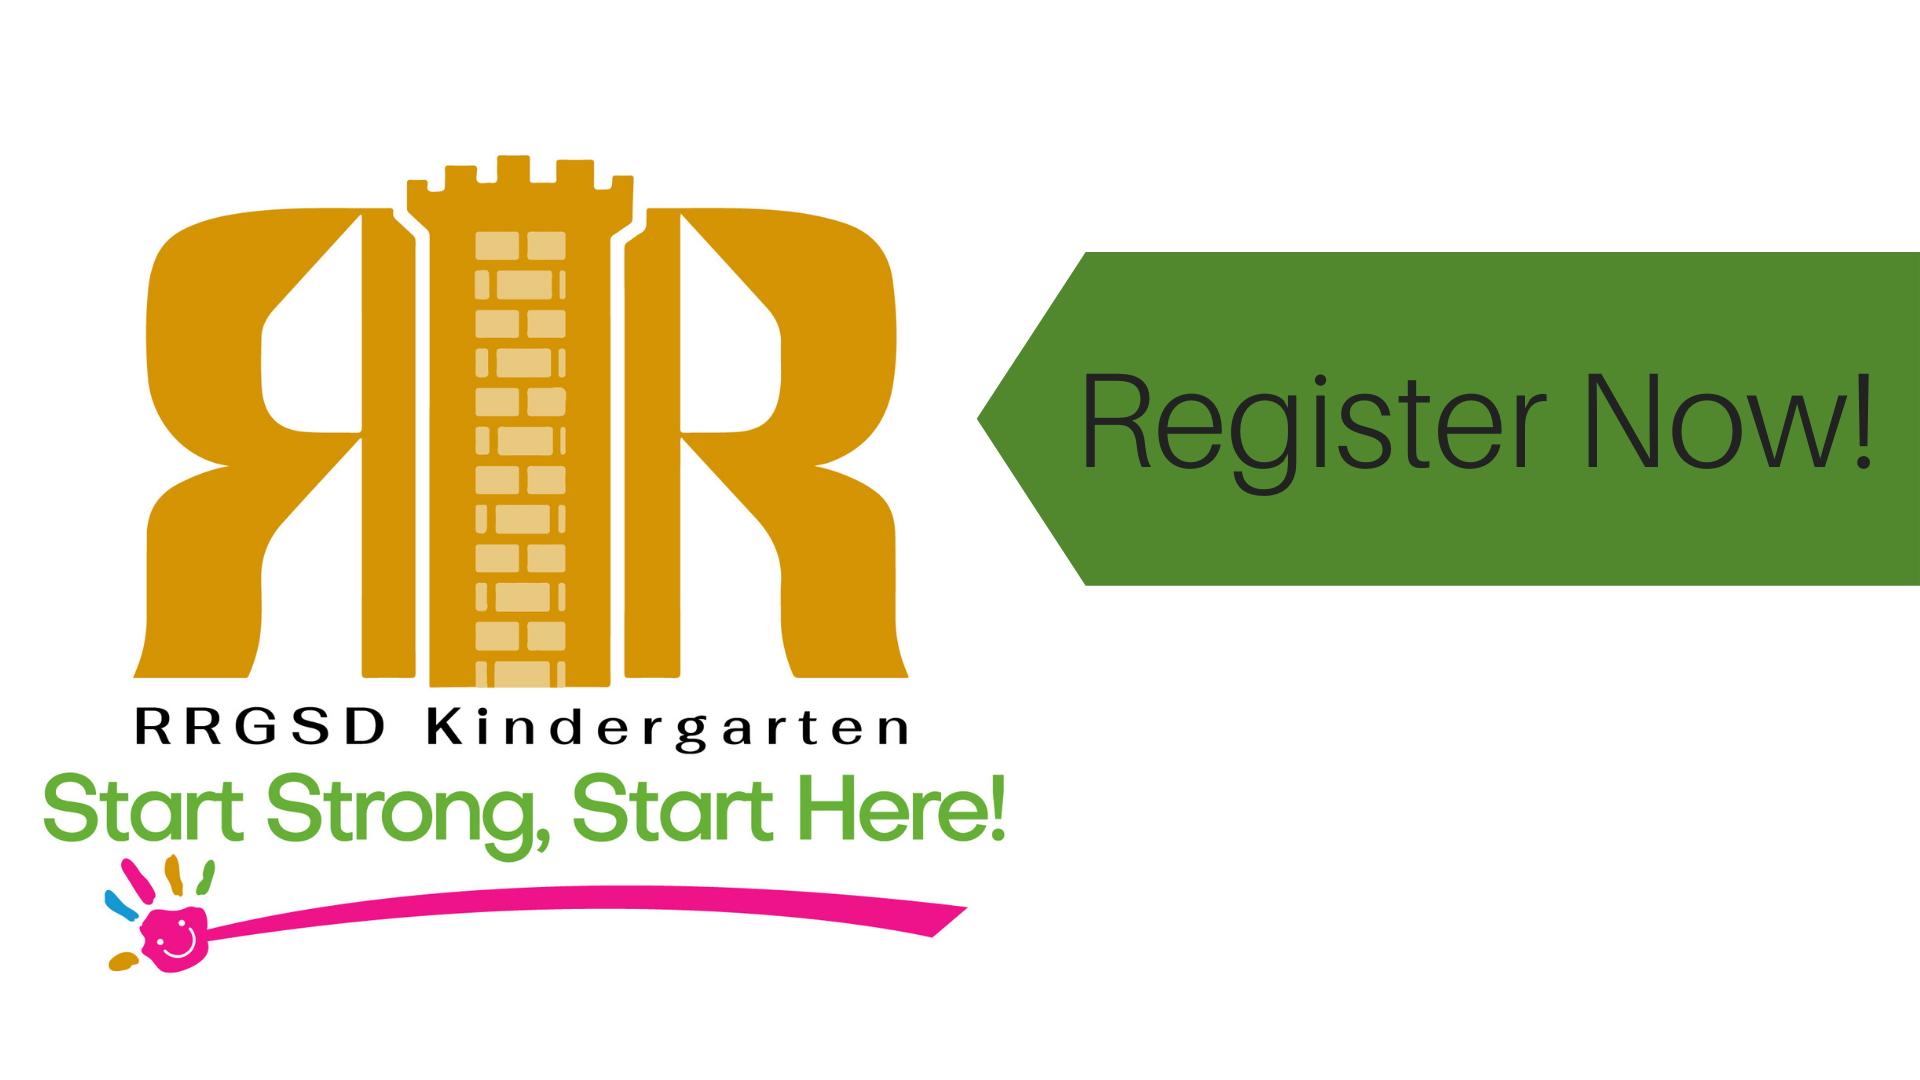 Register Now for Kindergarten